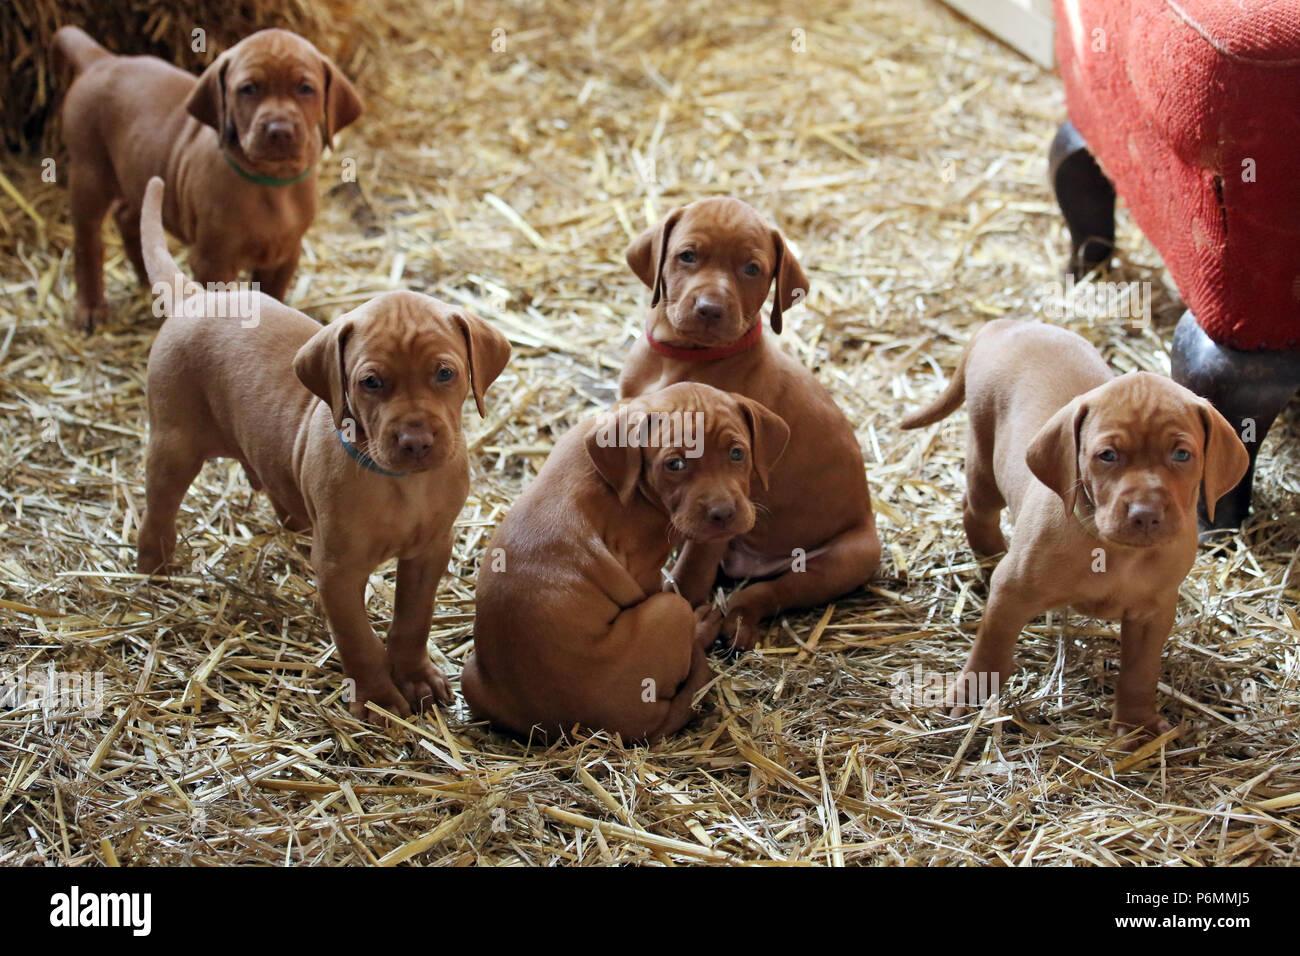 Neuenhagen, Germany, Magyar Vizsla Dog Puppies - Stock Image